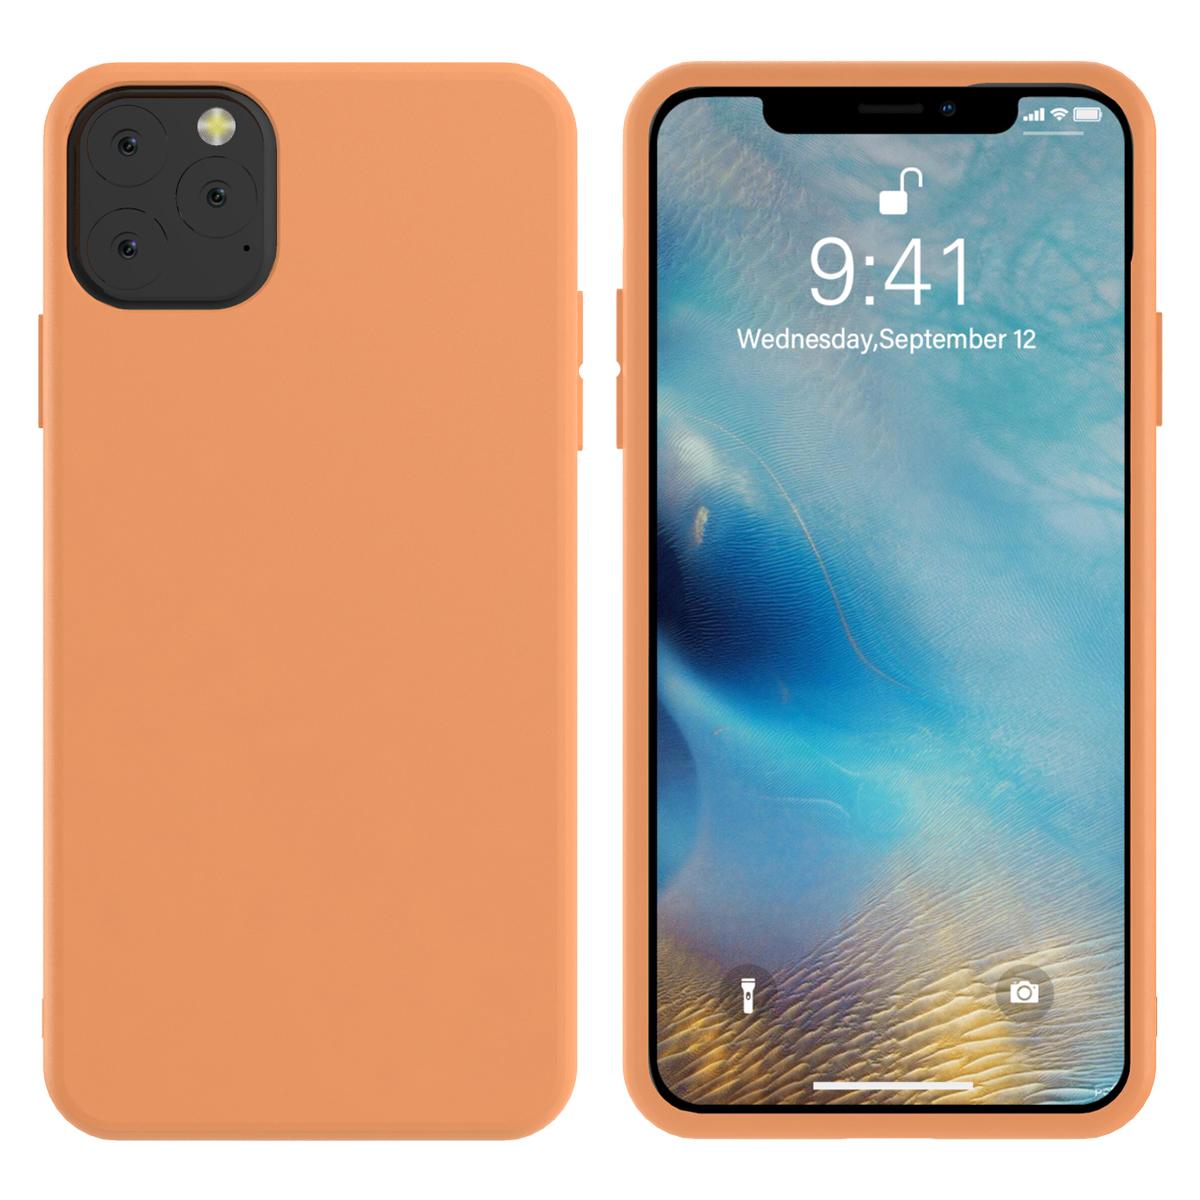 Torubia Silicone Case for iPhone 11/11 Pro/11 Pro Max 115